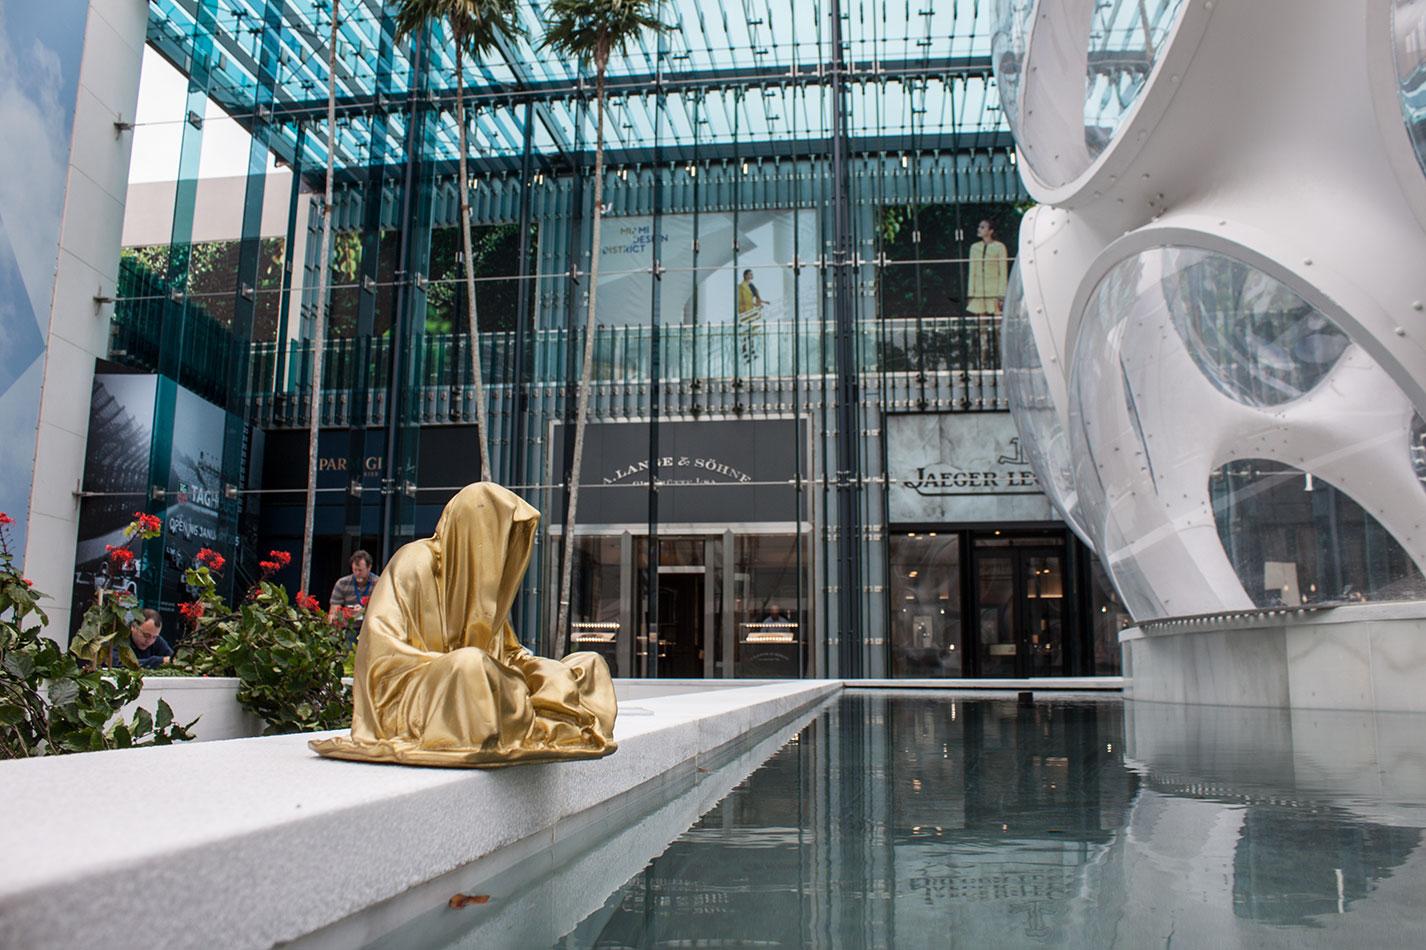 public-art-basel-miami-beach-fair-usa-florida-bass-museum-guardians-of-time-manfred-kili-kielnhofer-contemporary-fine-art-modern-arts-design-antiques-sculpture-6646